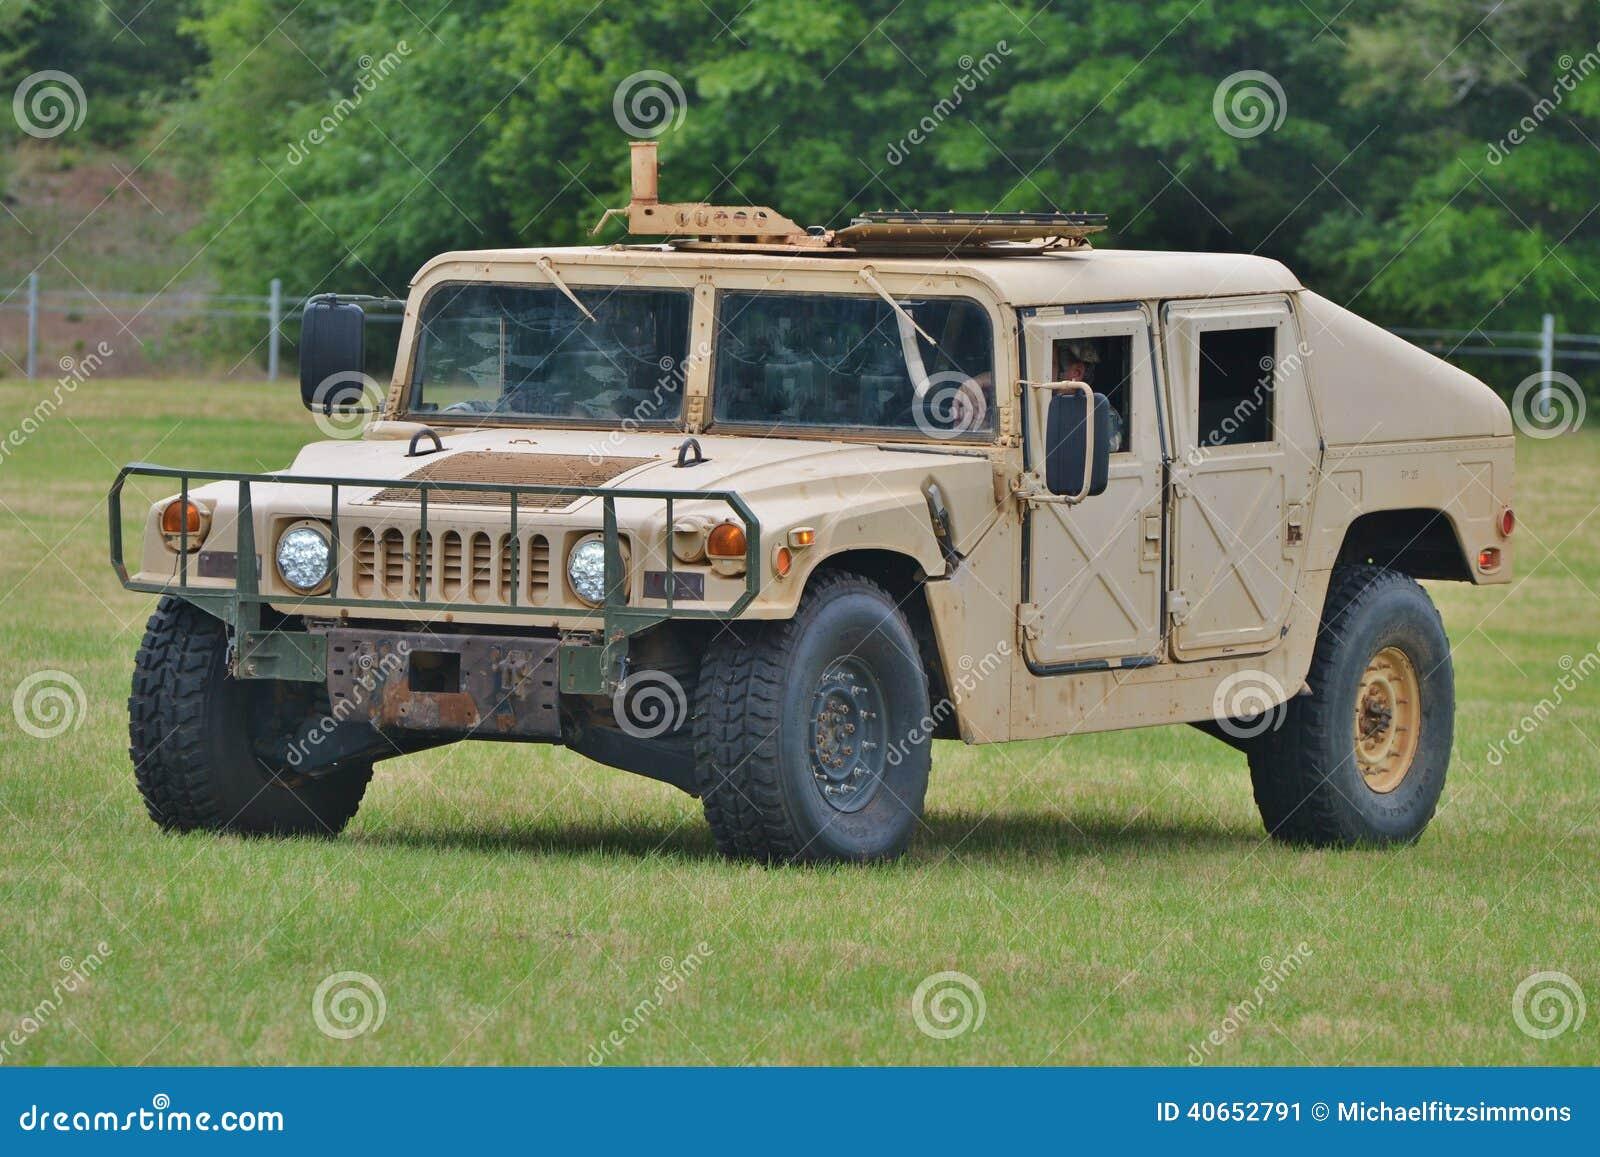 Military humvee hummer hmmwv stock photo image 40652791